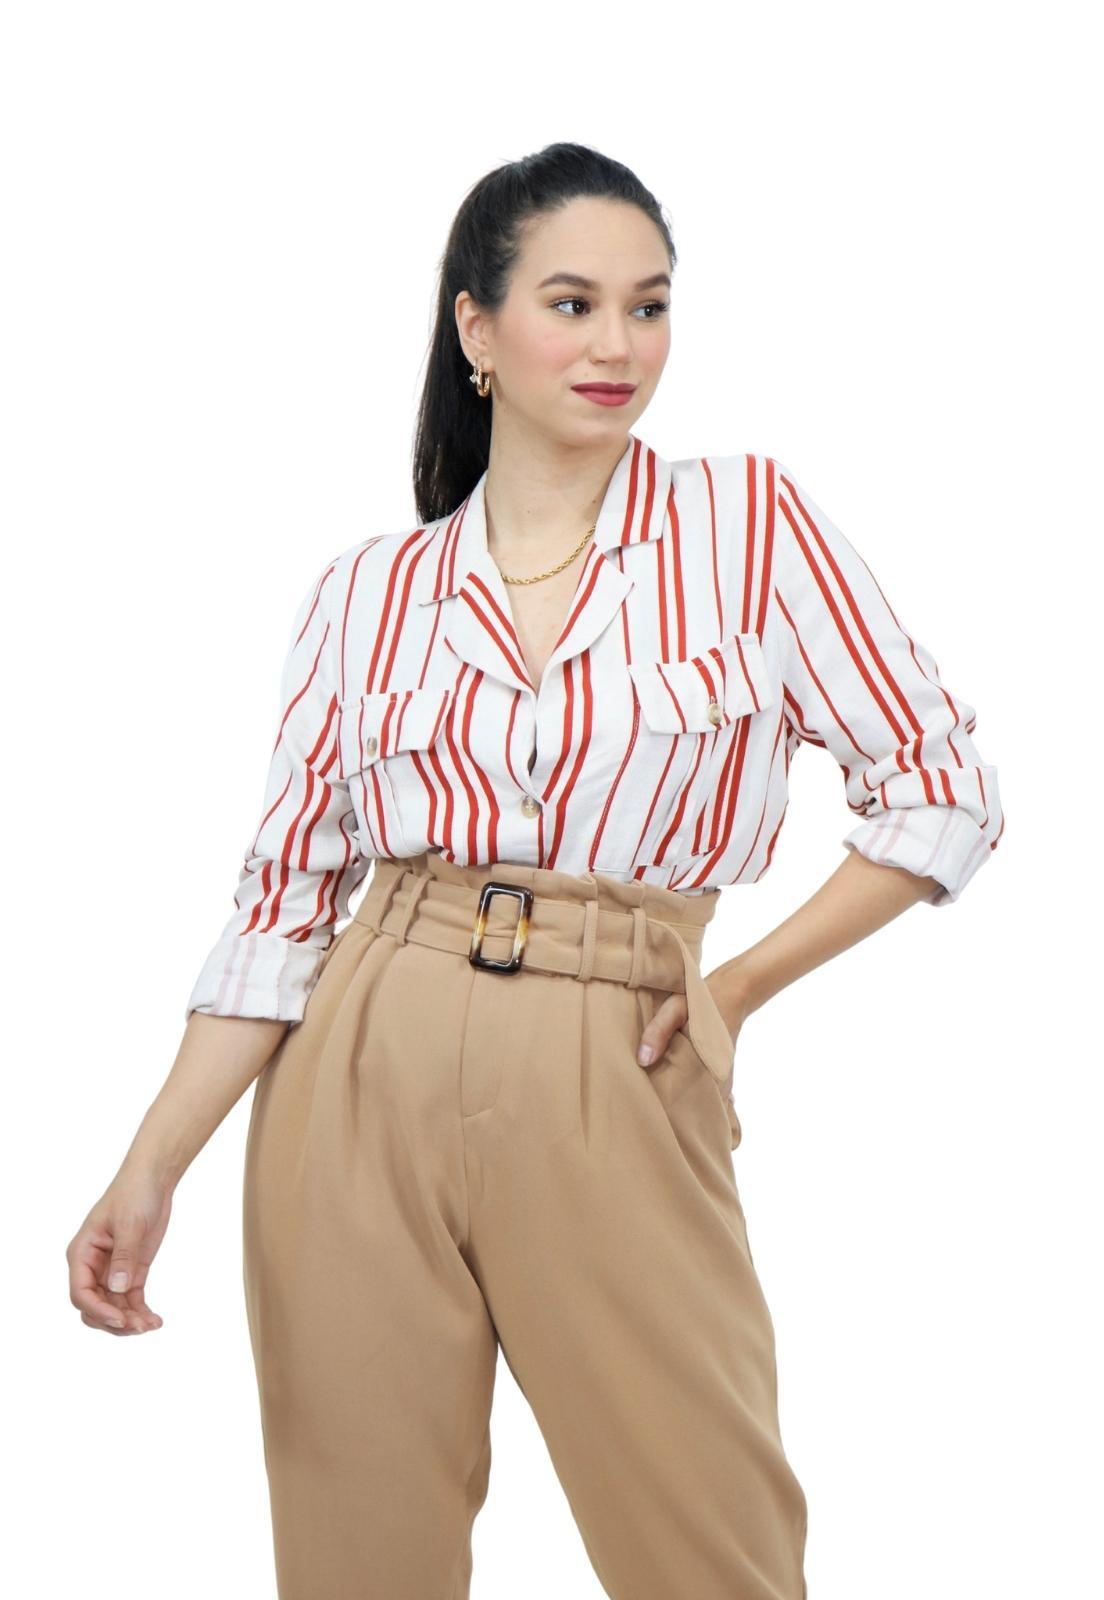 Camisa Feminina Curta Manga Longa Estampa Listra Elegante